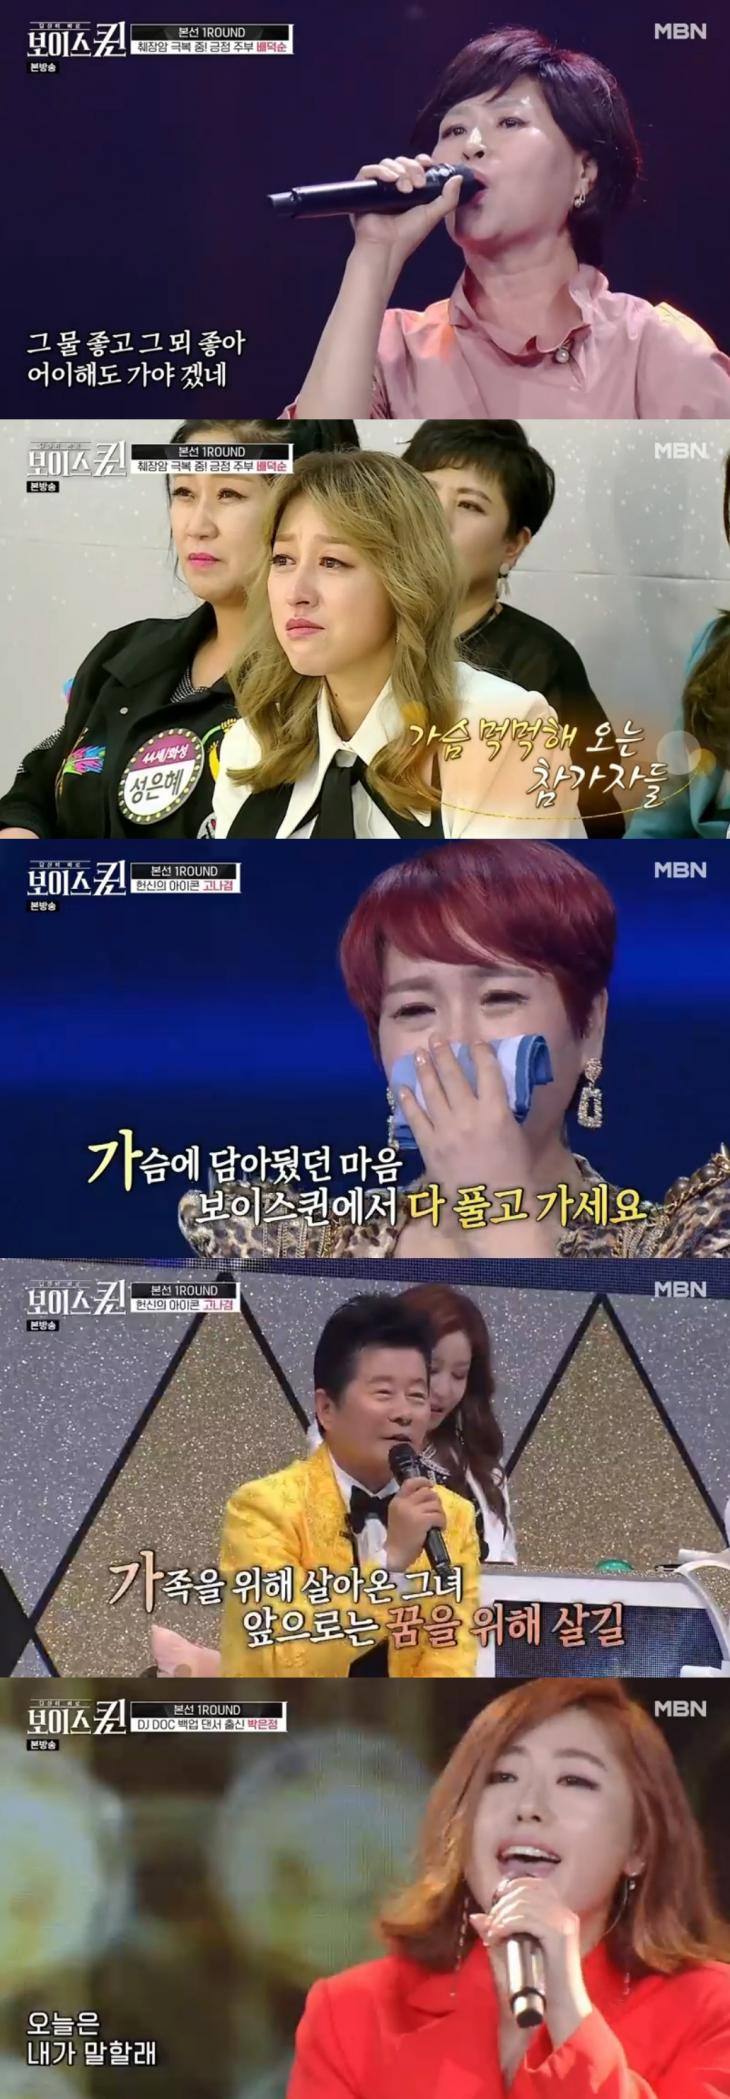 MBN 예능프로그램 '보이스퀸'